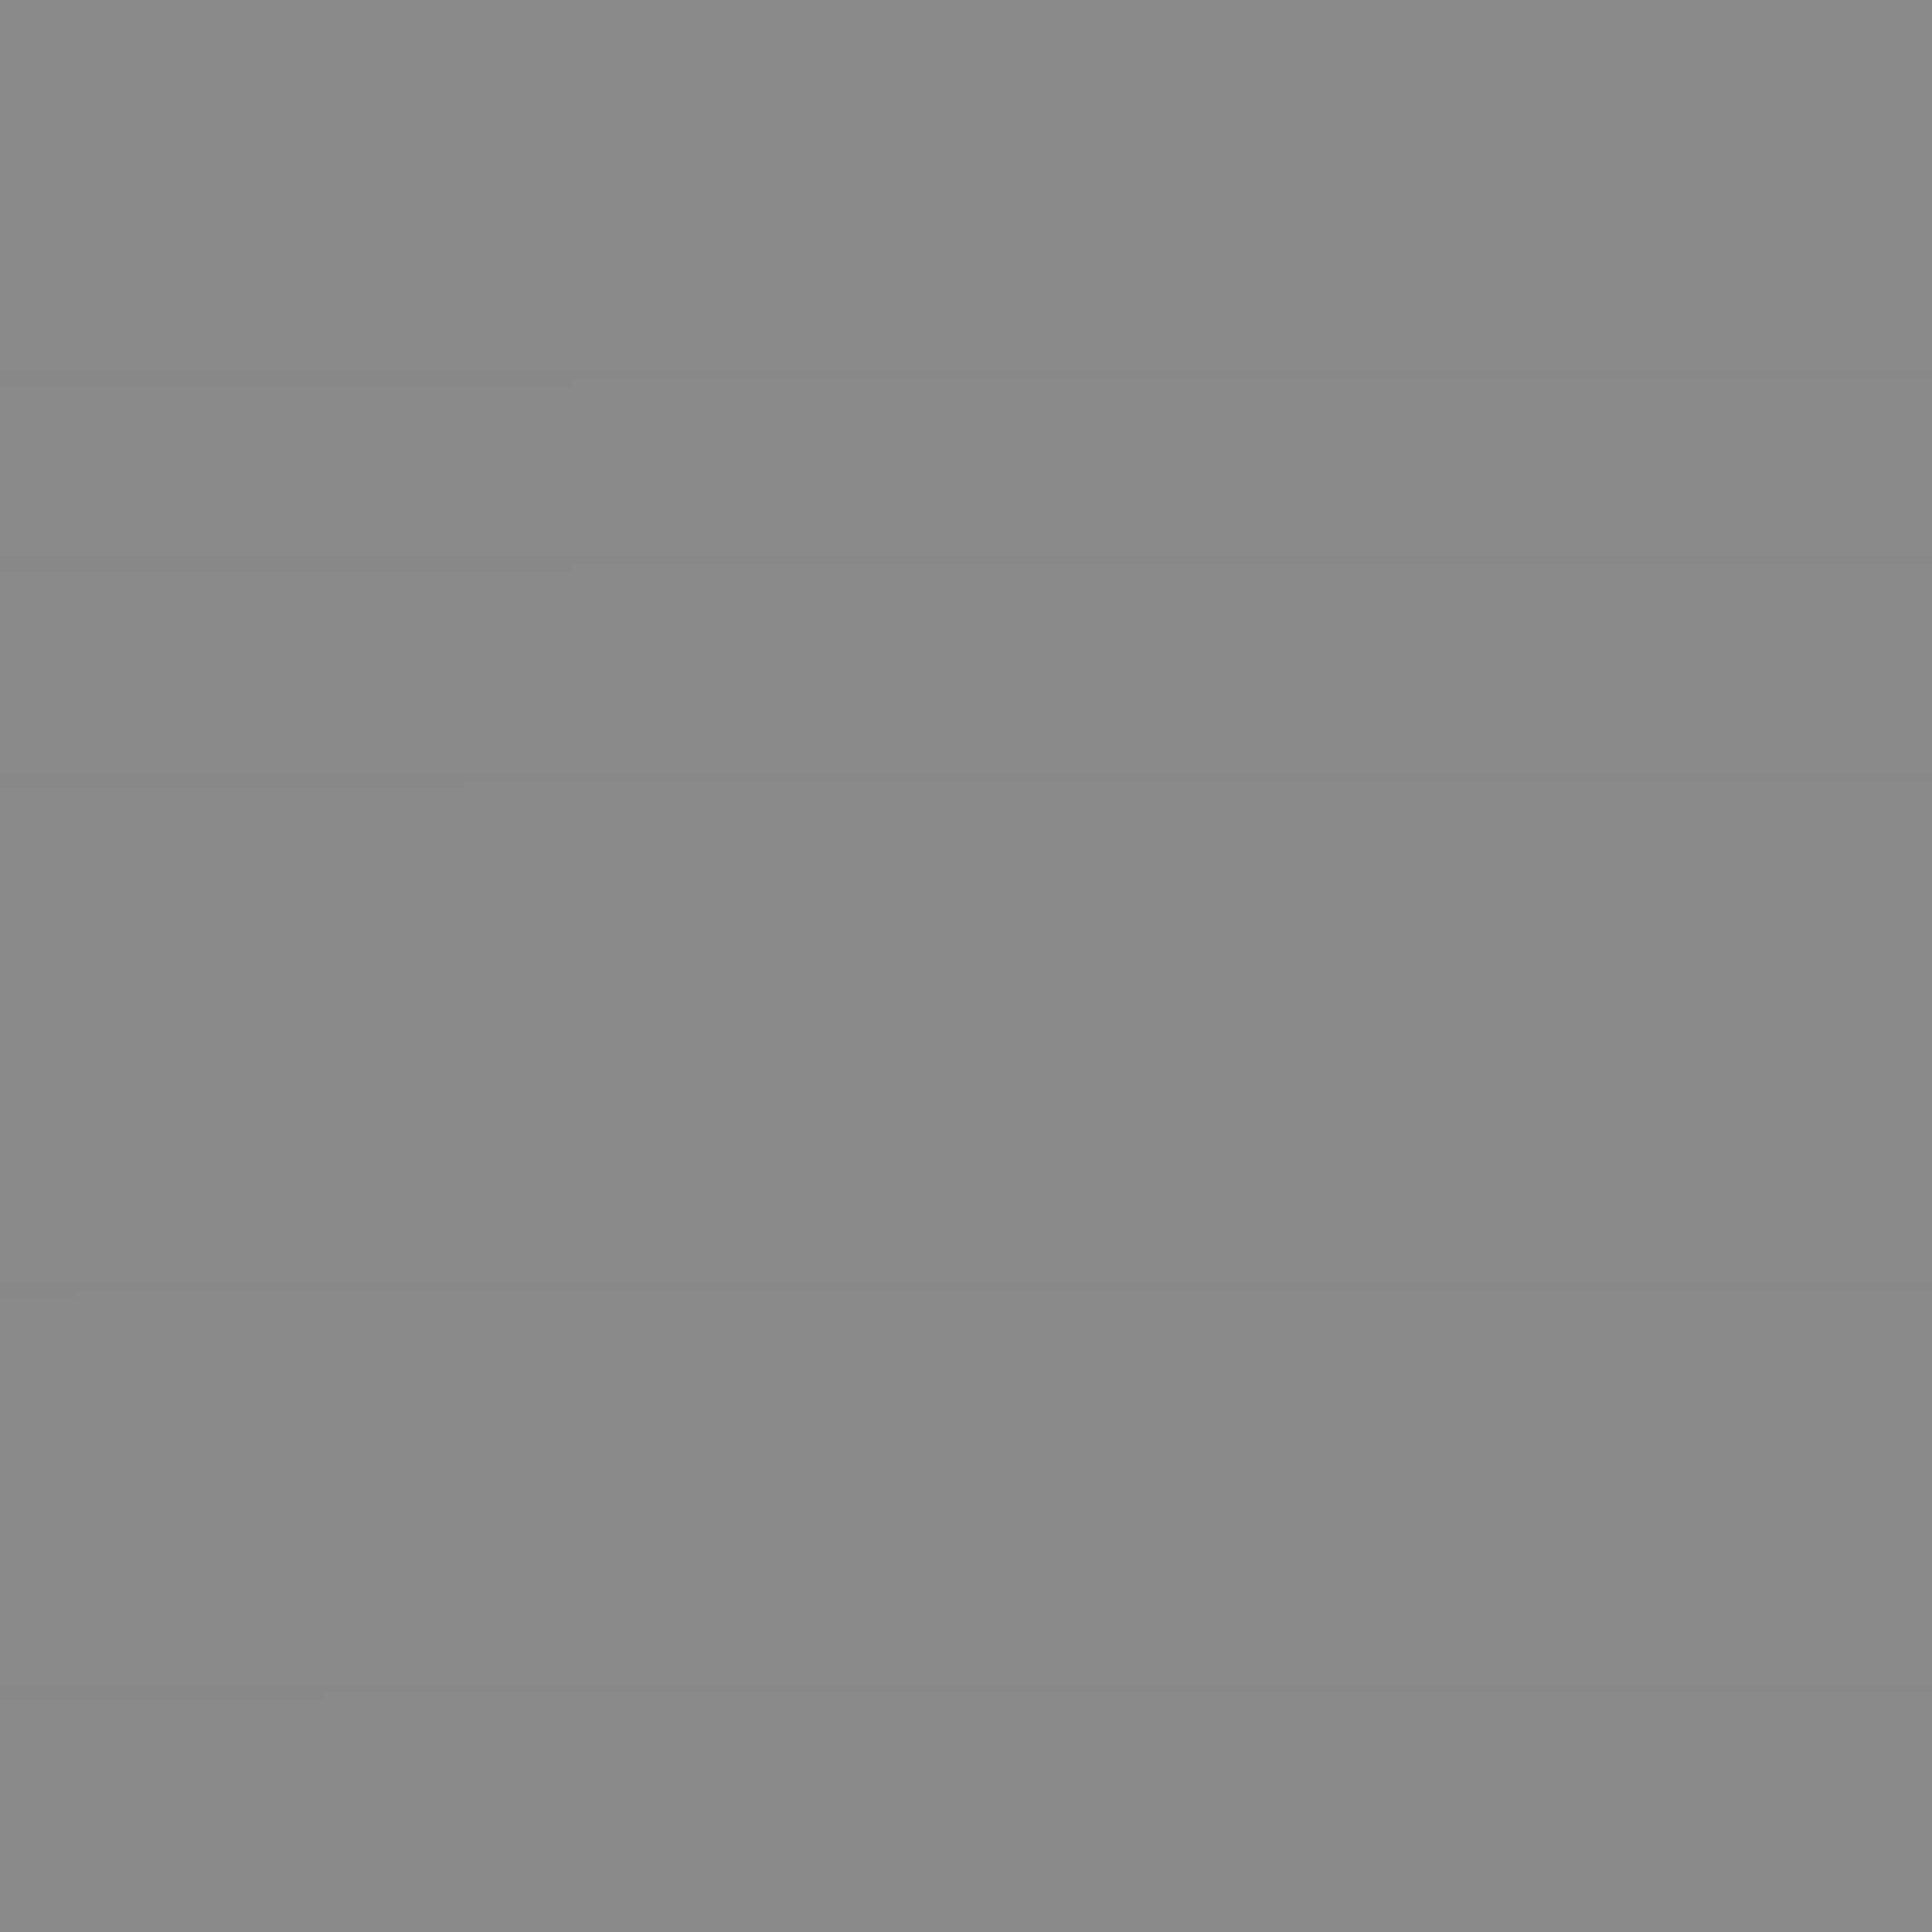 Vloertegels 20x20 - Patchwork Black & White - Grey